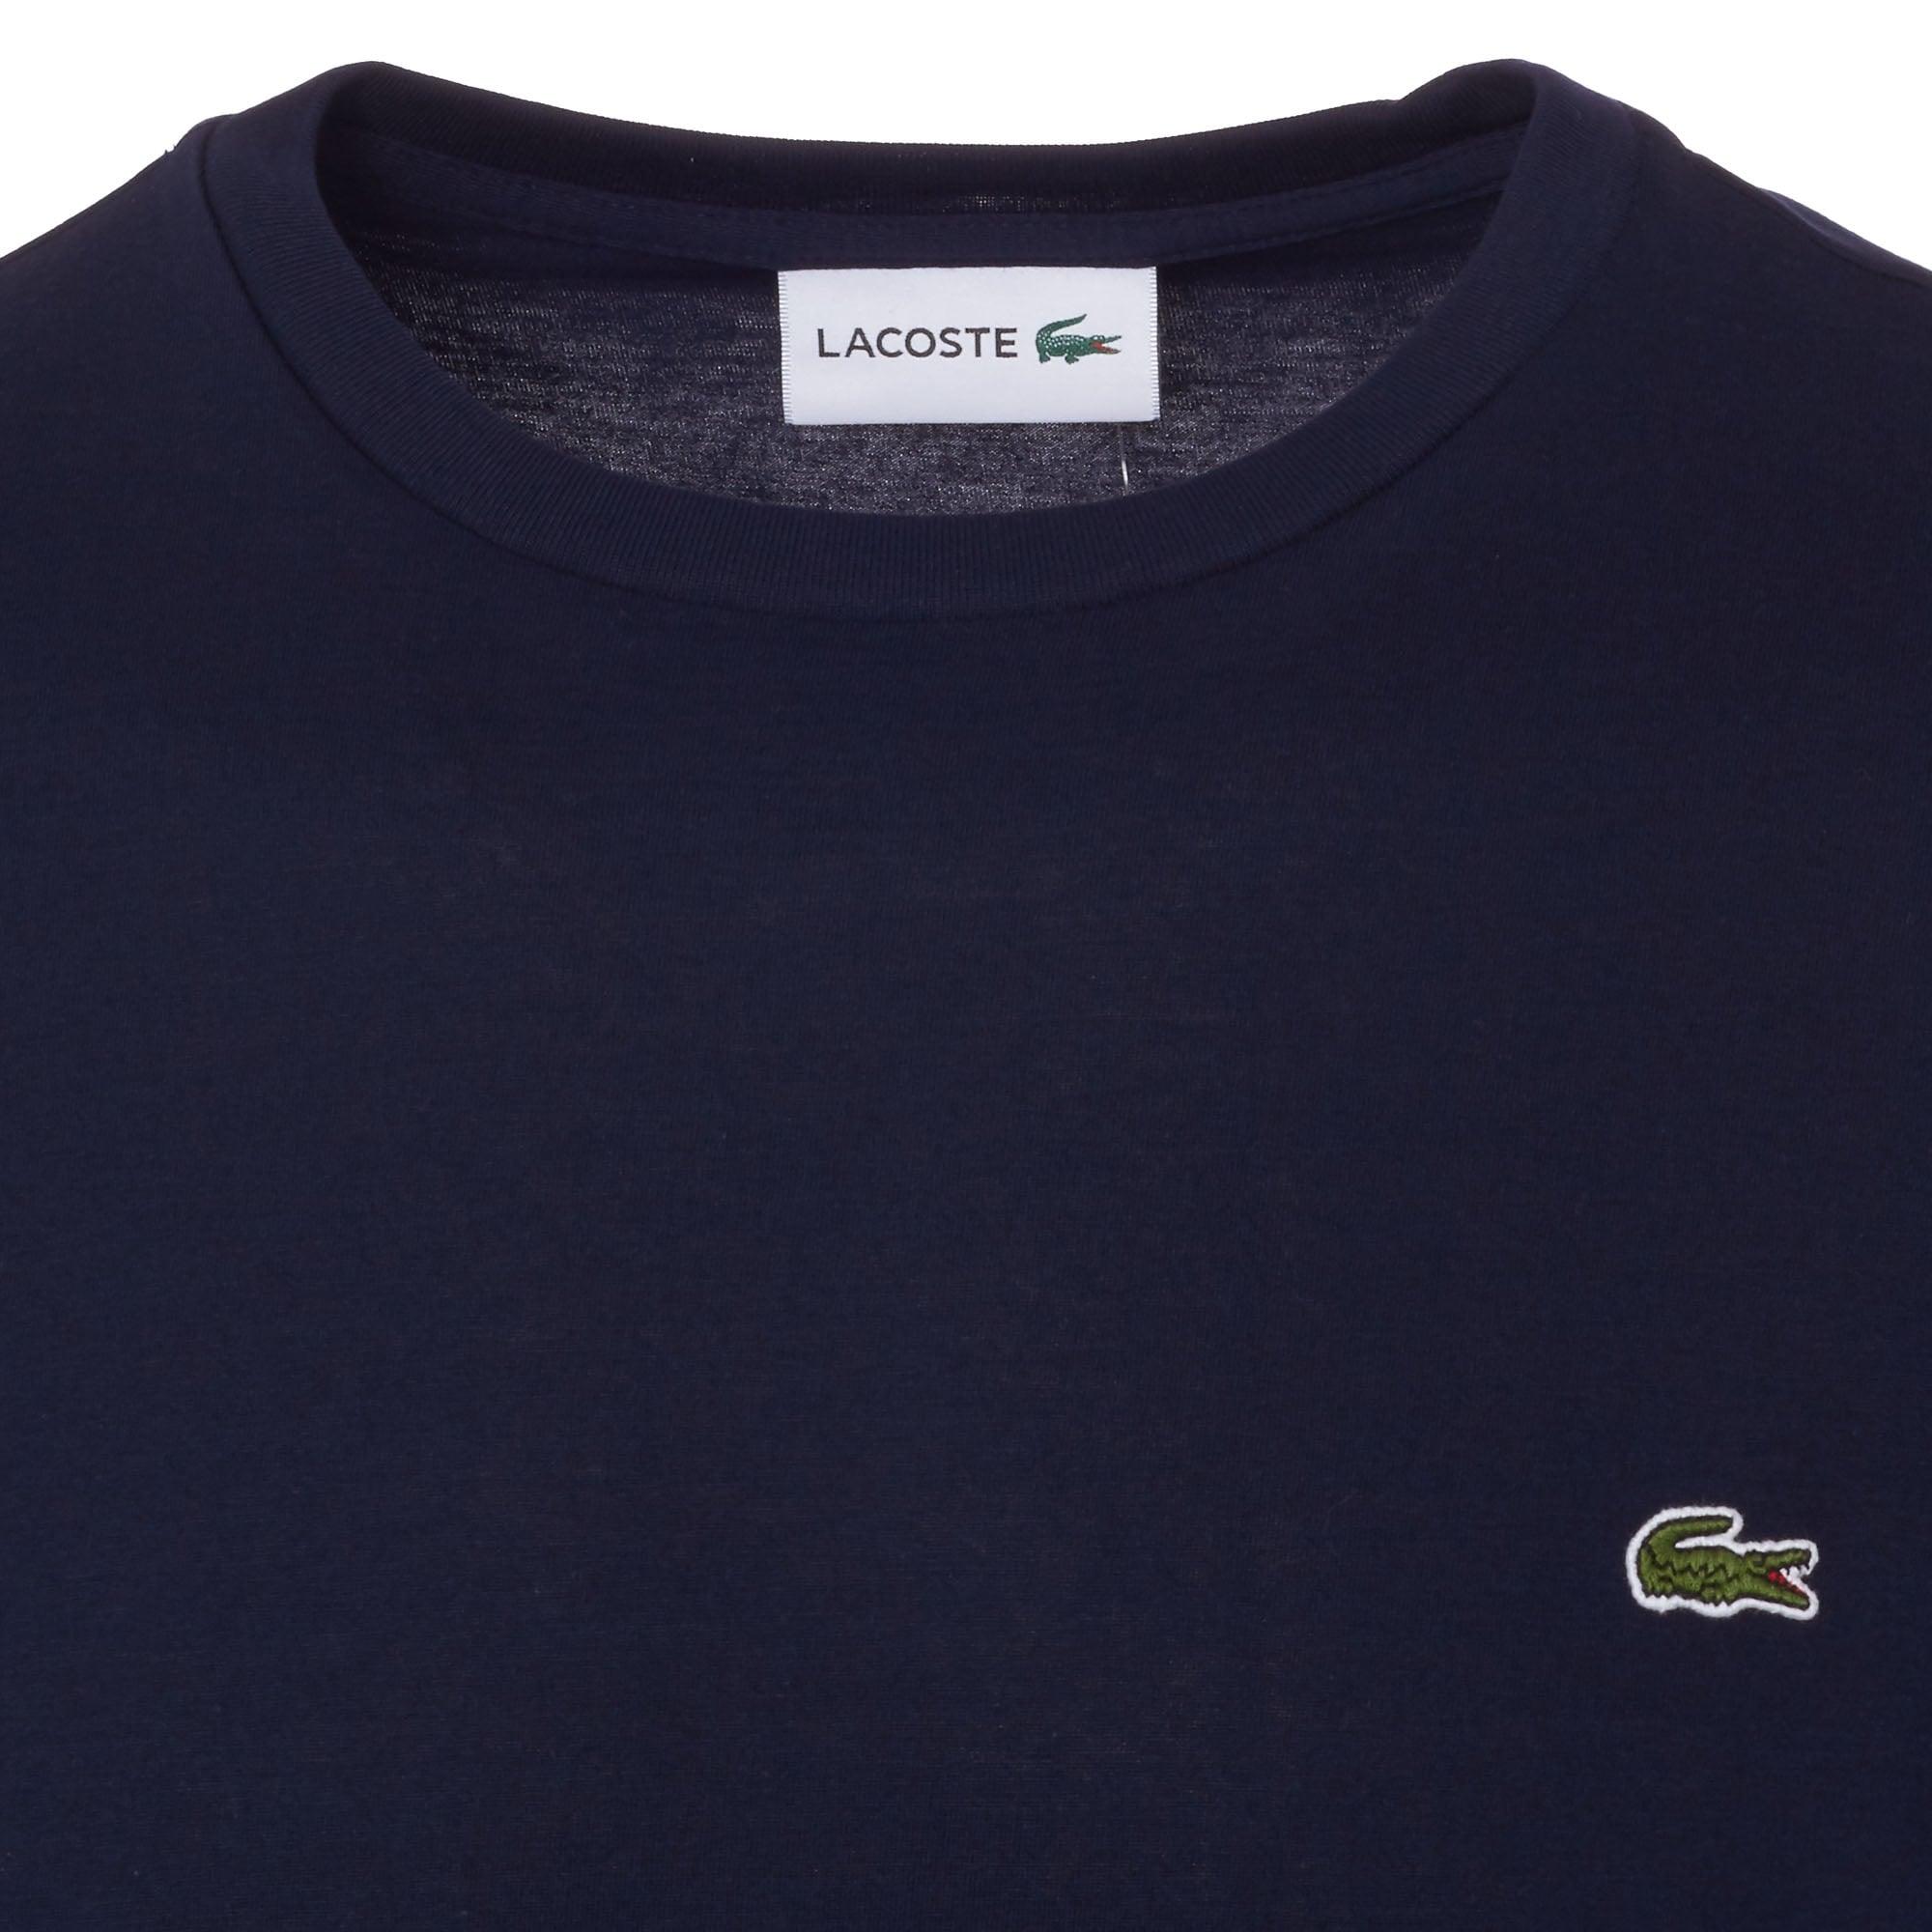 856bd0a3b6979 Lacoste Marine Crew Neck Pima Cotton T-Shirt